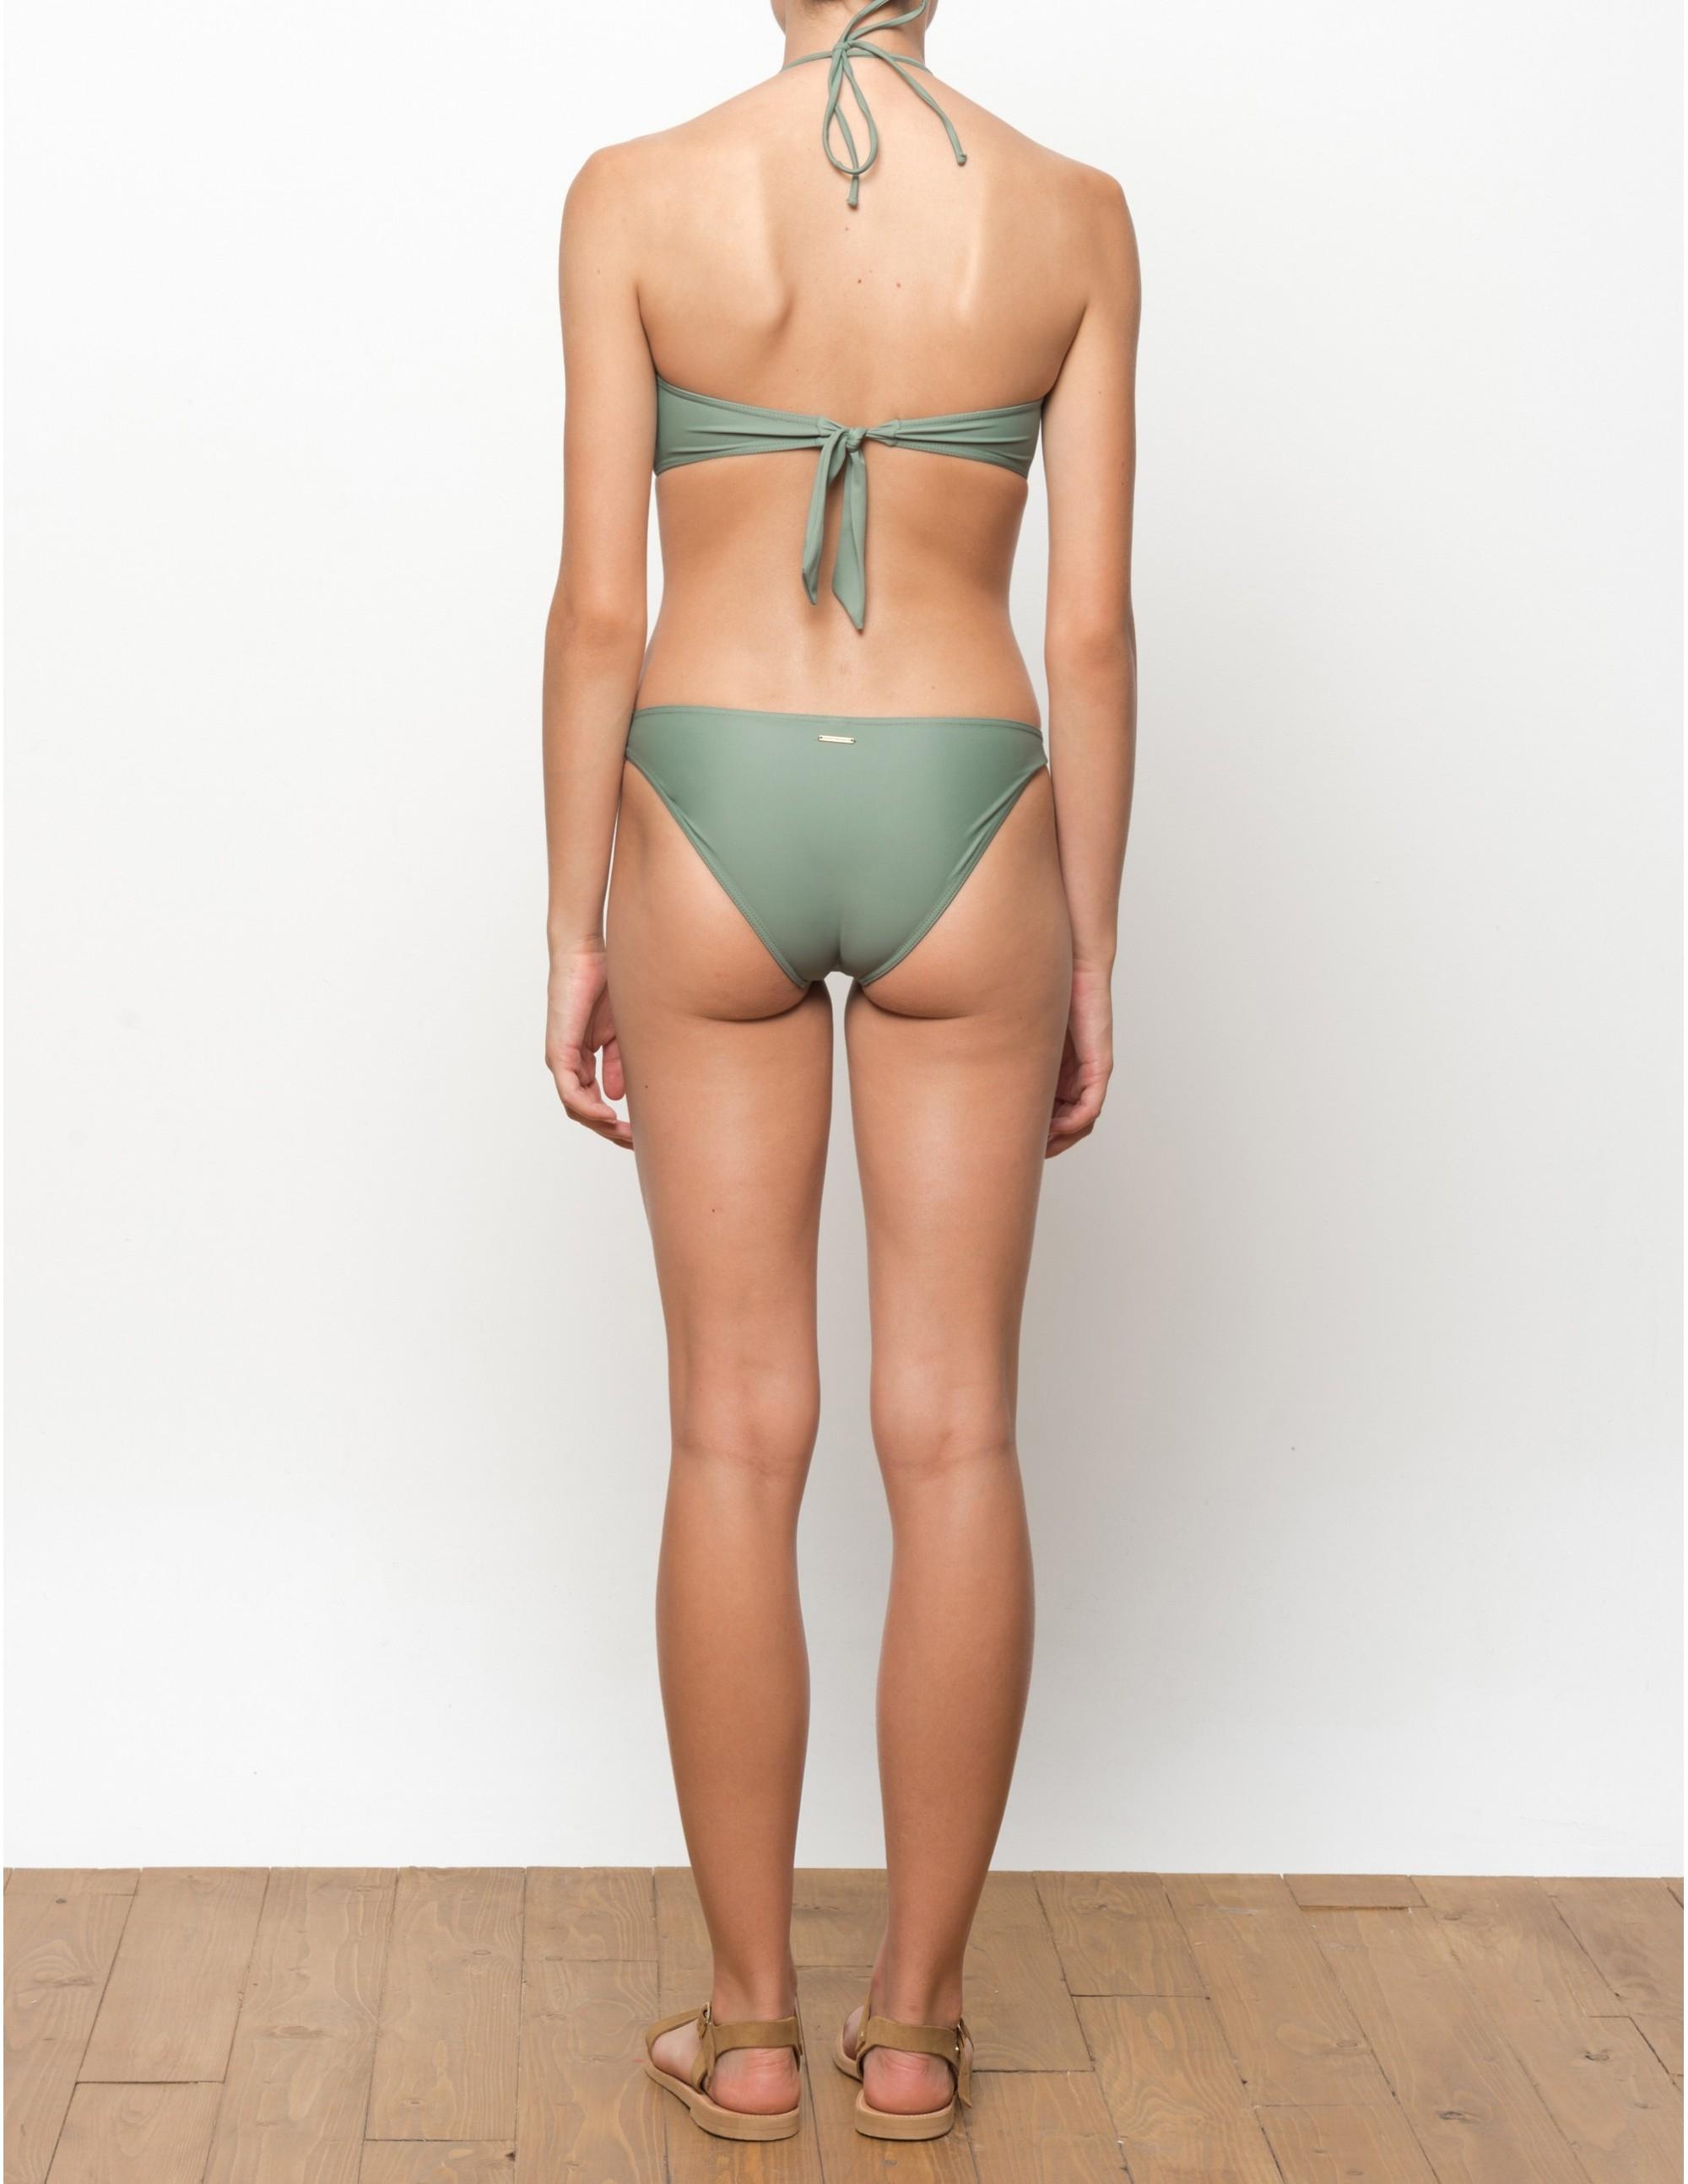 VUMA bikini bottom - SERENGETI